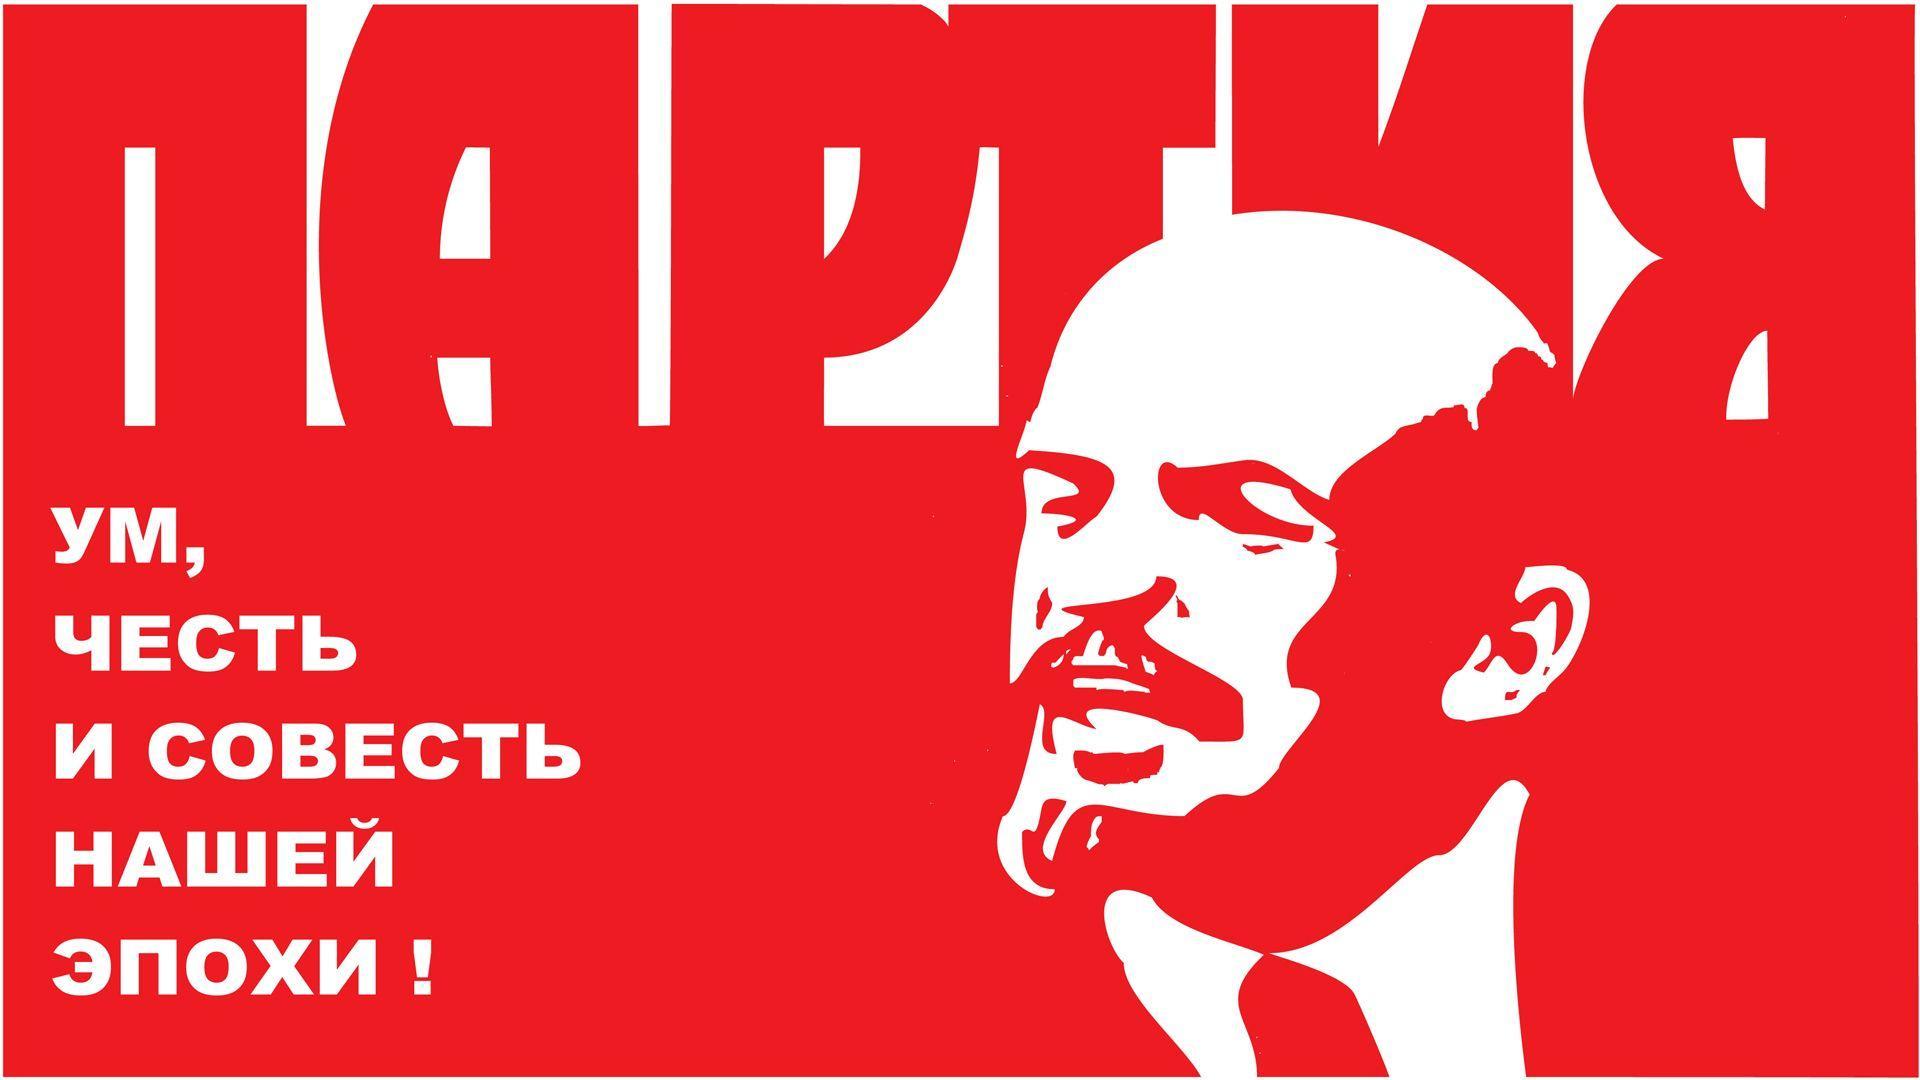 Pokemon Quote Wallpaper Lenin Wallpapers Wallpaper Cave